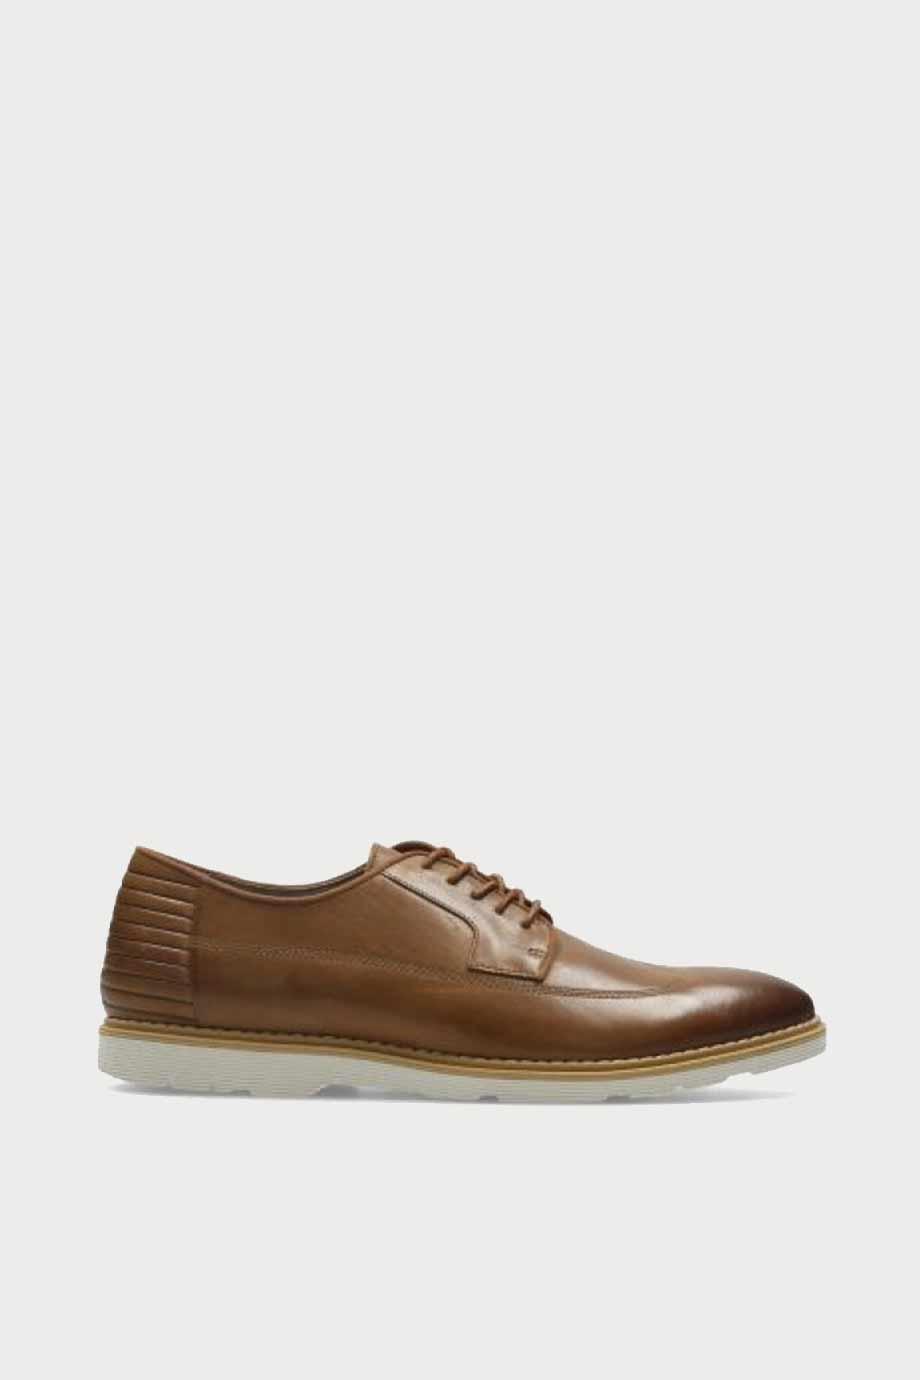 spiridoula metheniti shoes xalkida p Gamberson Style clarks tan leather 1